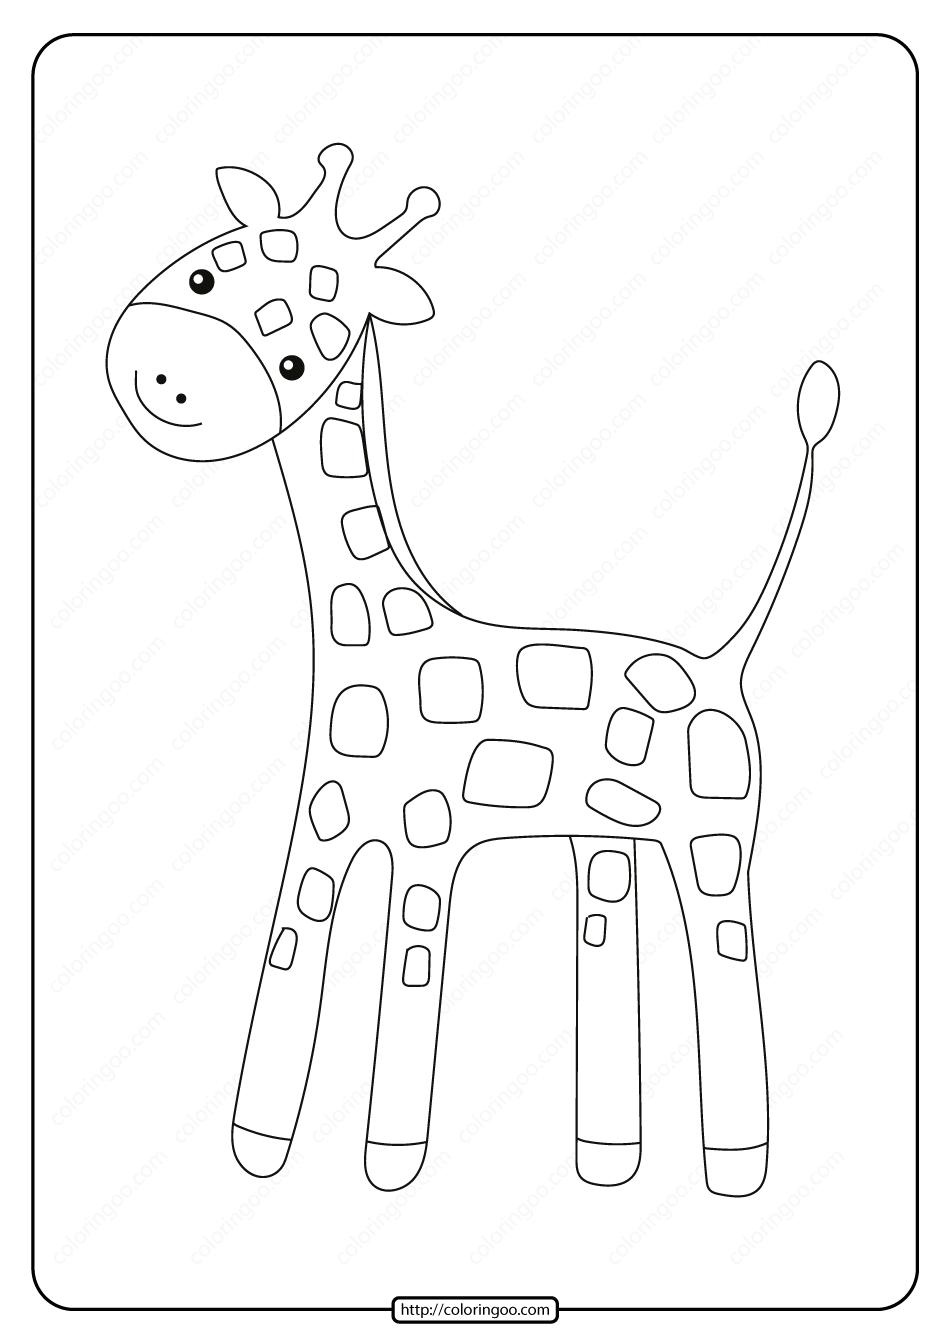 Free Printable Baby Giraffe Pdf Coloring Page In 2020 Giraffe Coloring Pages Giraffe Drawing Baby Giraffe